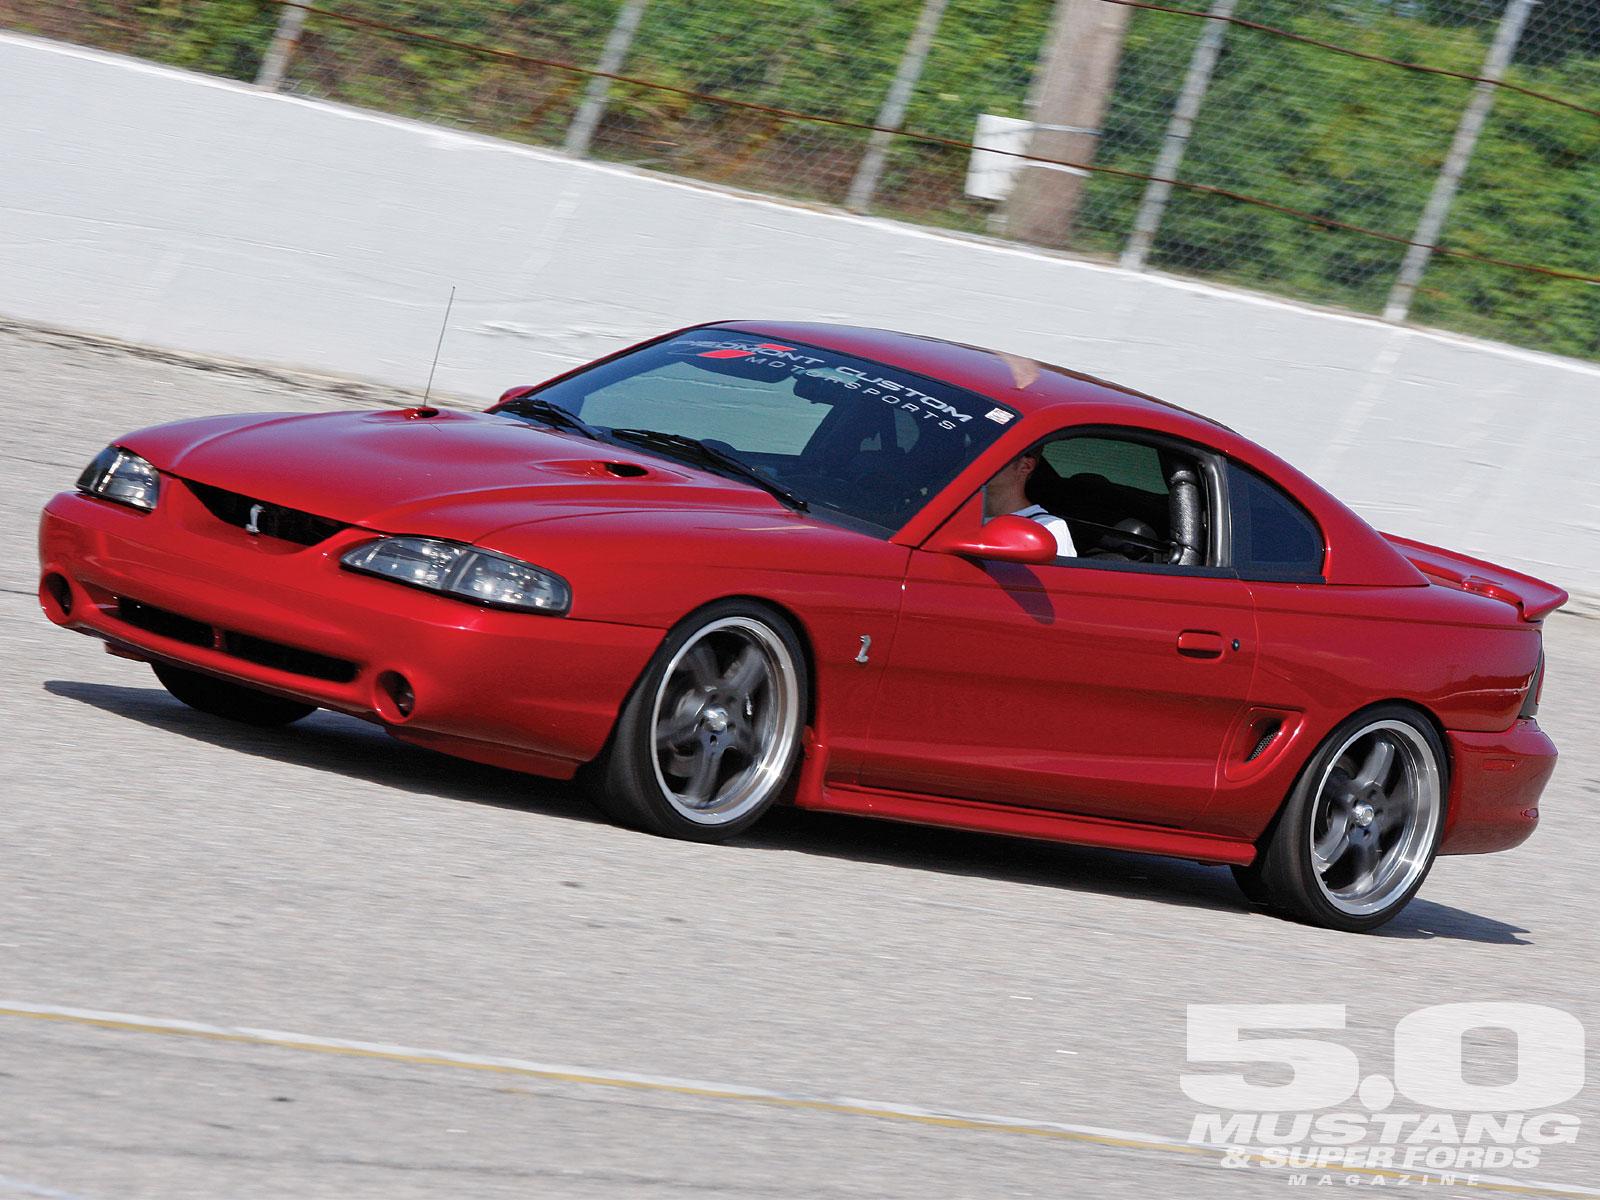 sn-mustang-race-car-build-SN-Mustang-wallpaper-wp429175-1